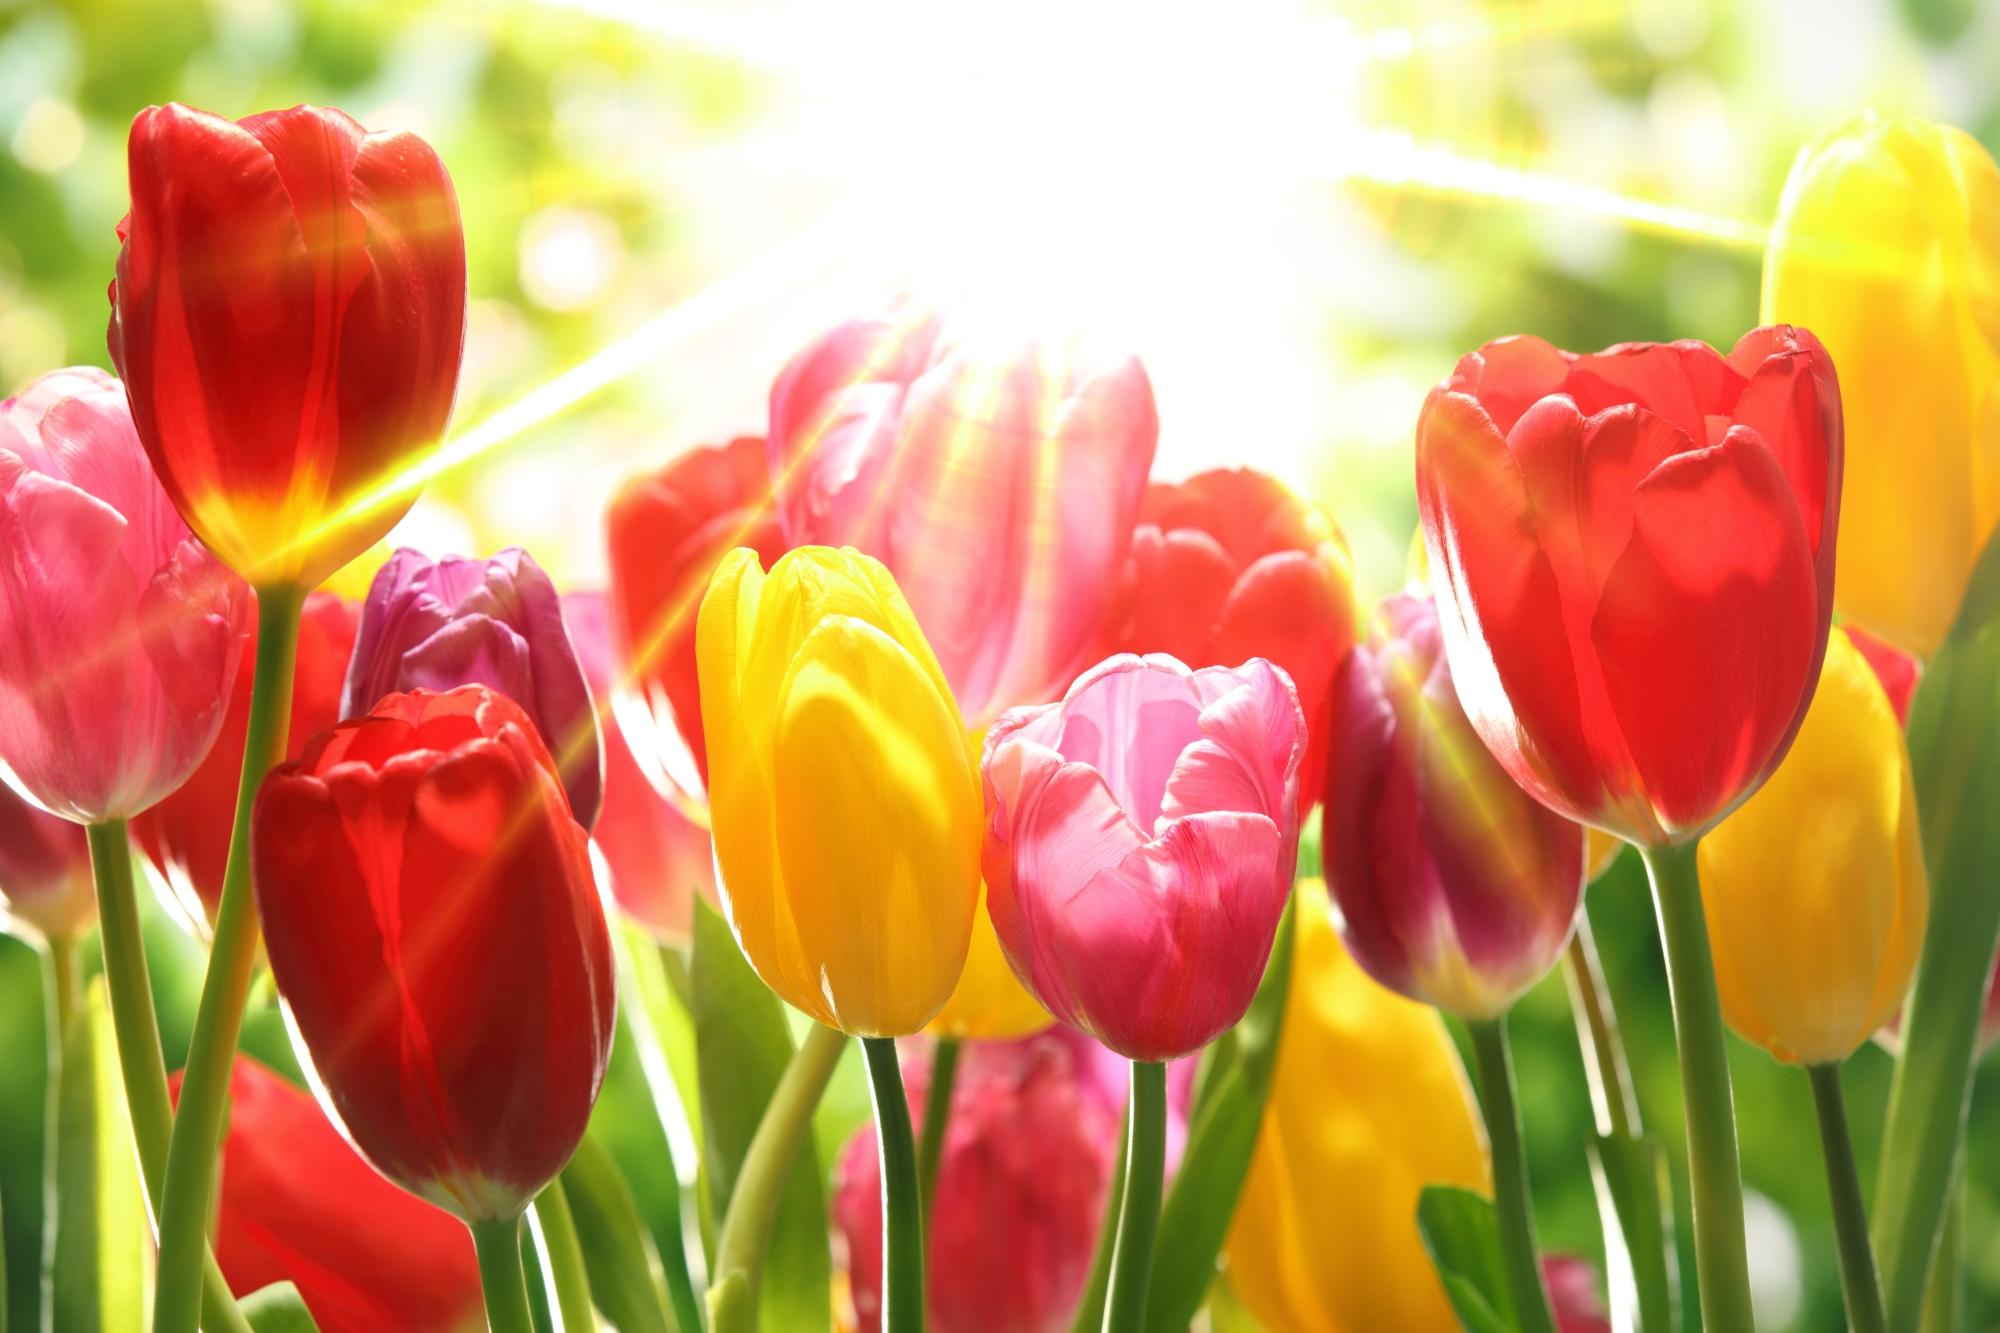 colourful-tulipa-szinpompas-tulipanok-5687091271.jpg